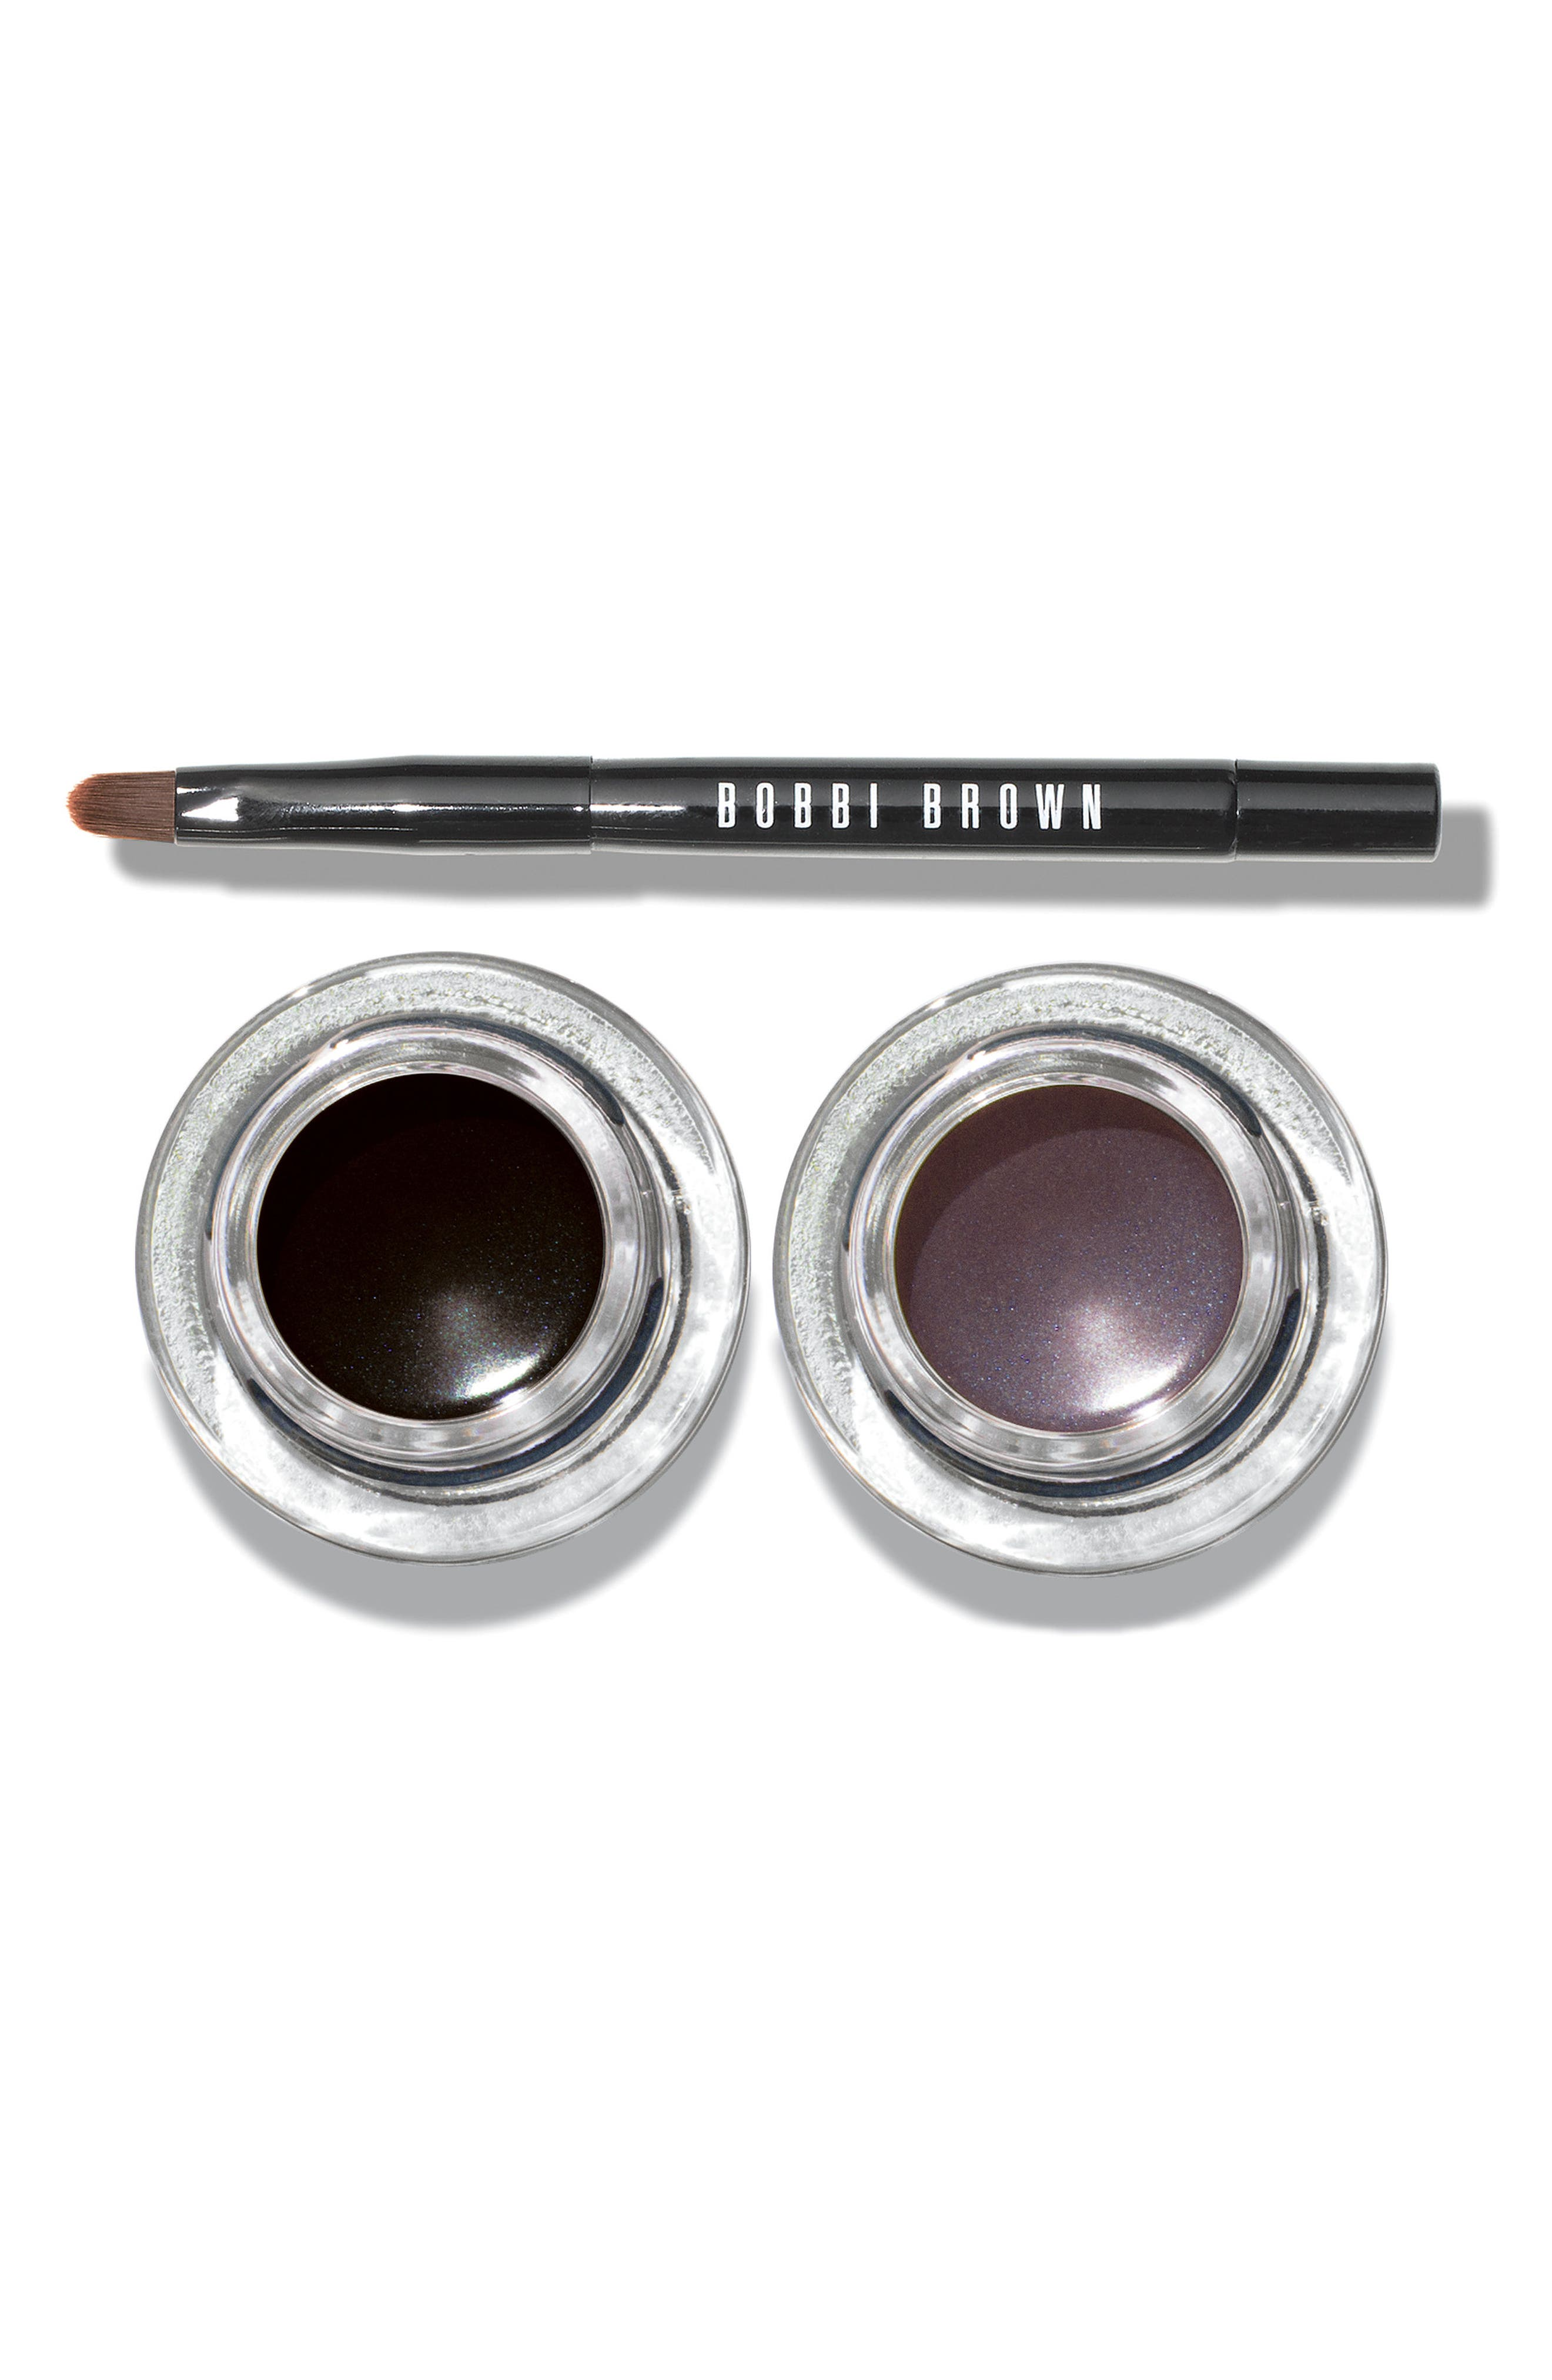 Bobbi Brown Cat-Eye Long-Wear Gel Eyeliner & Brush Set ($42 Value)